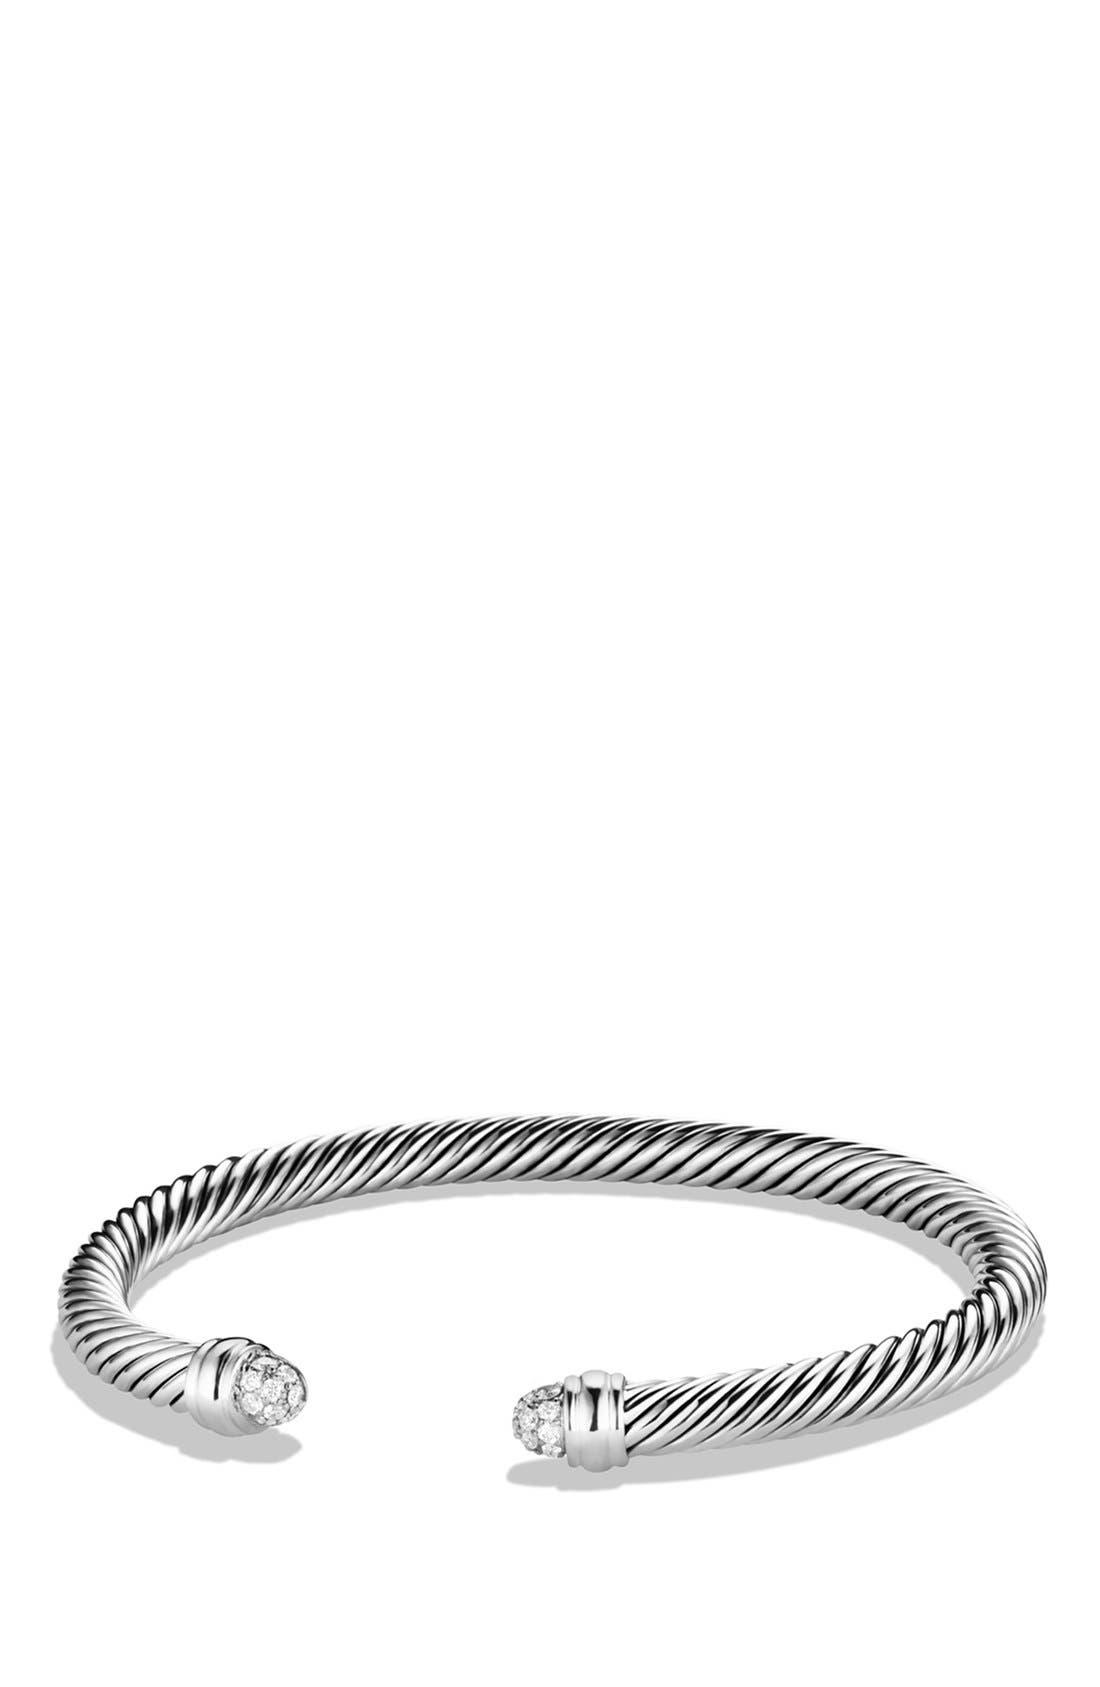 Cable Classics Bracelet with Diamonds, 5mm,                             Main thumbnail 1, color,                             Diamond